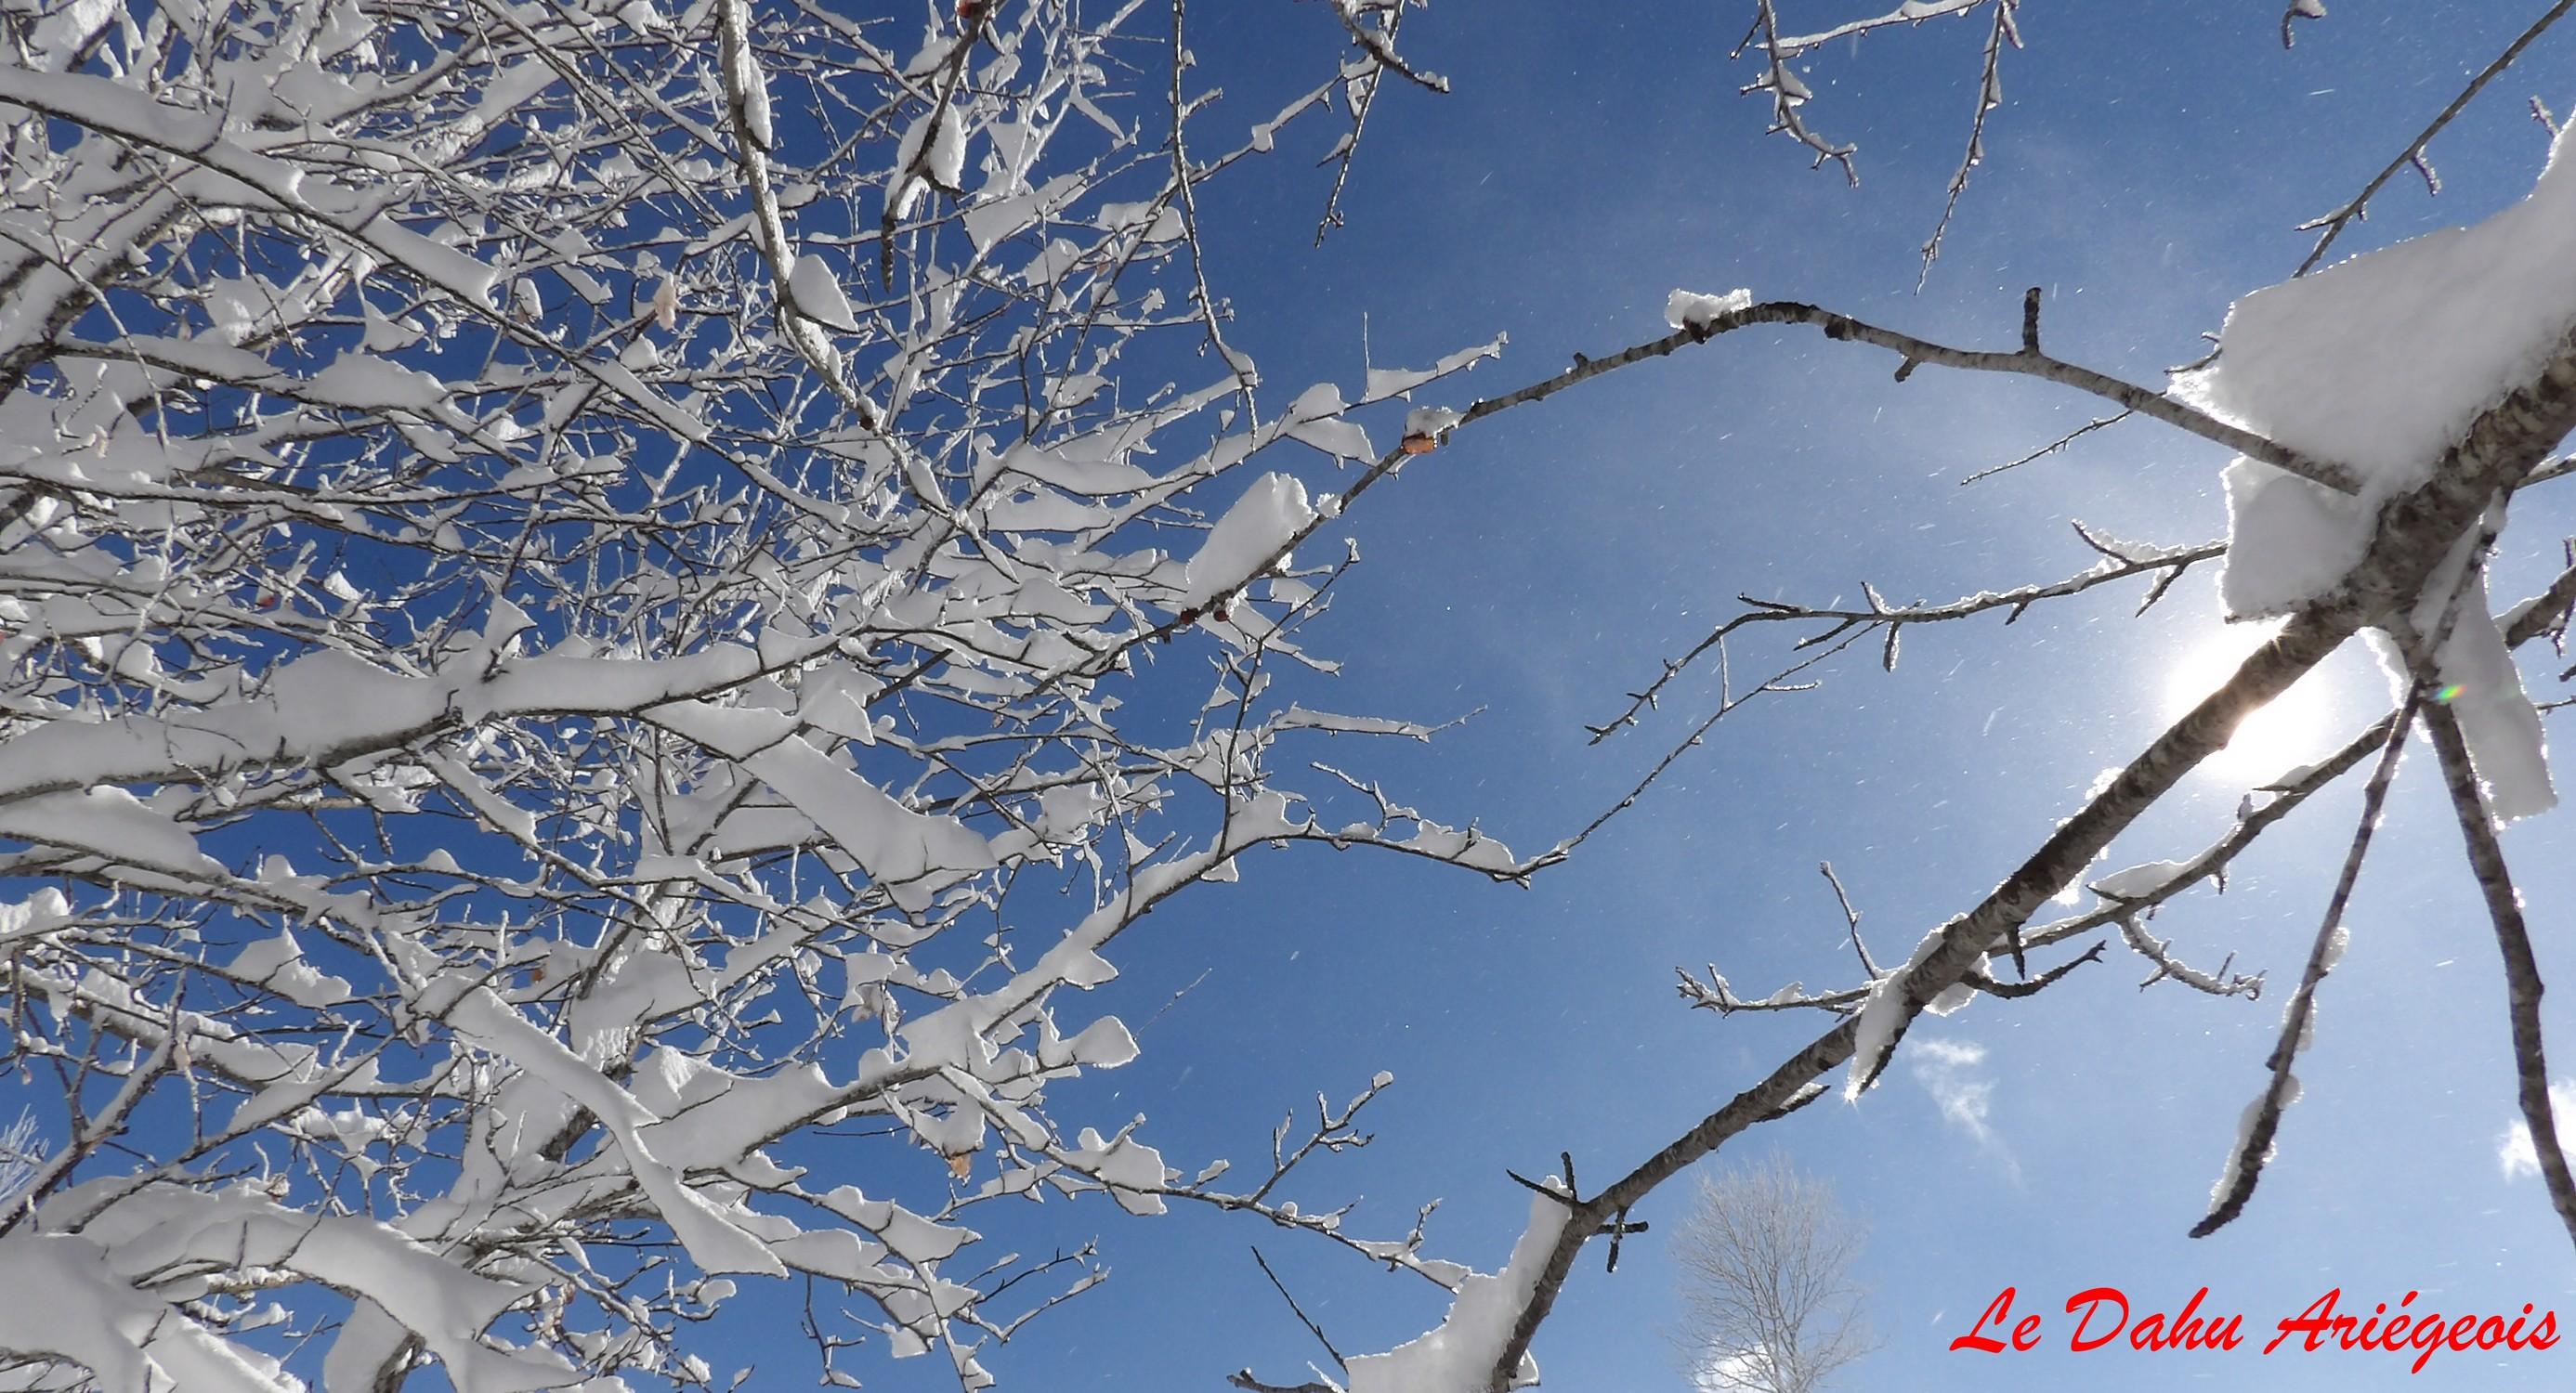 Raquettes a neige - Ariege 2